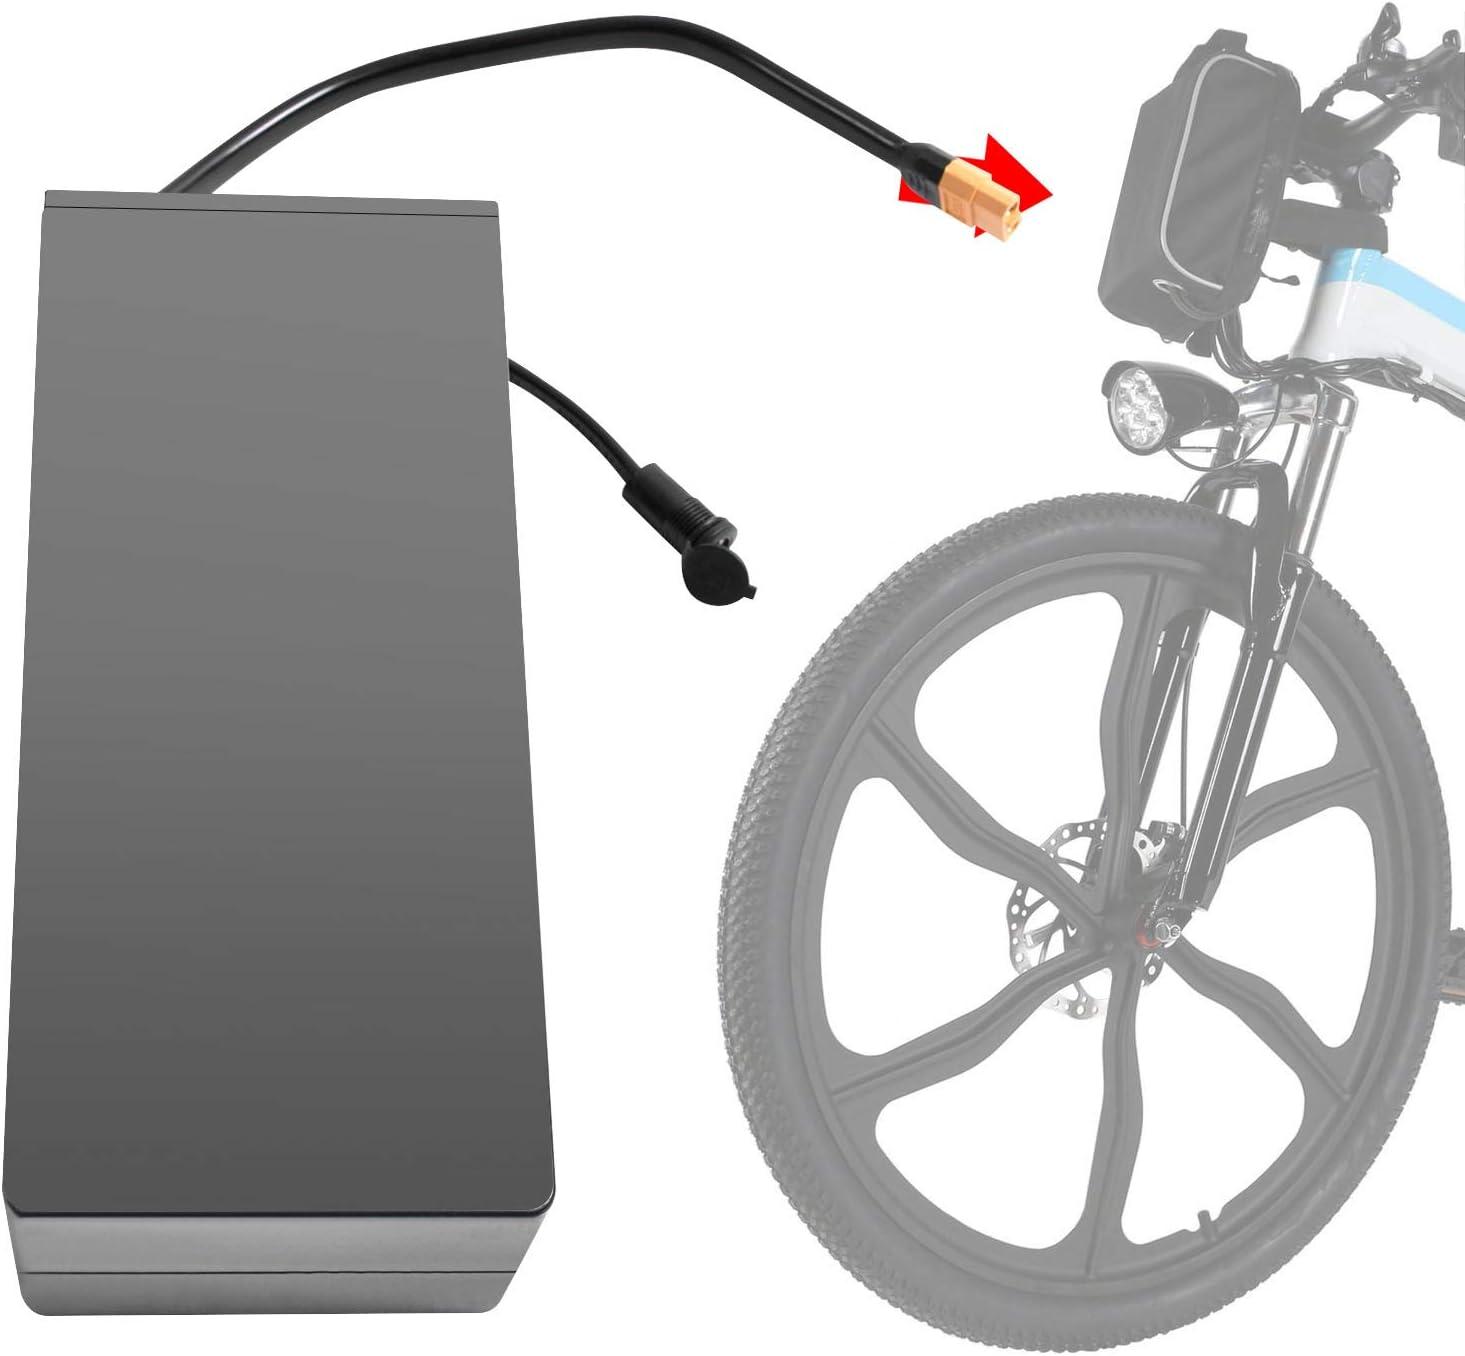 36V 8Ah Batterie f/ür E-Bike Elektrofahrrad 20 Zoll ANCHEER Herausnehmbare Lithium Akku